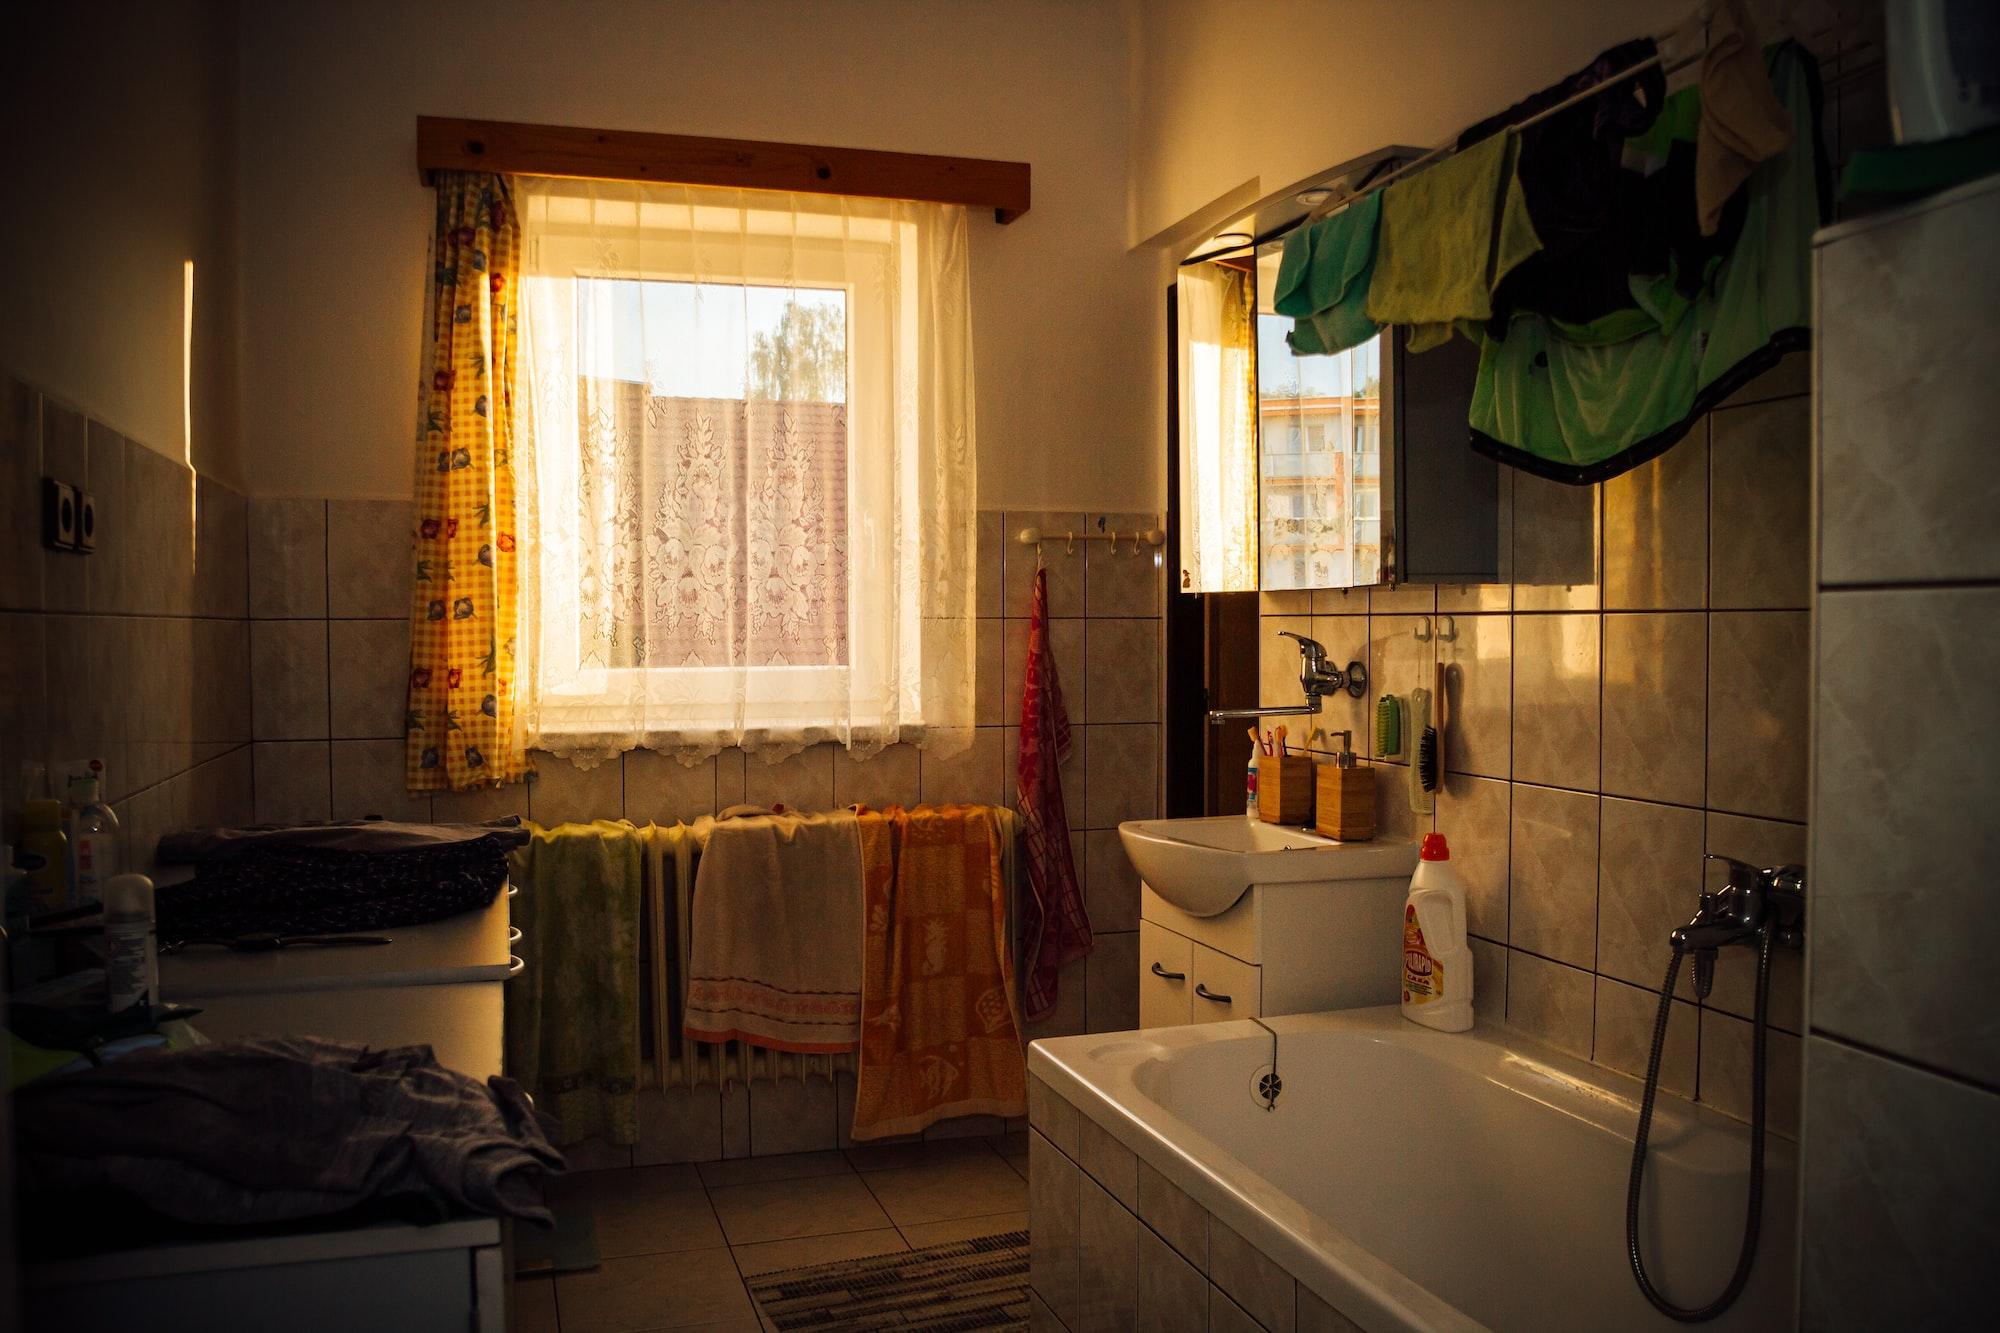 Bathrooms, where to begin?